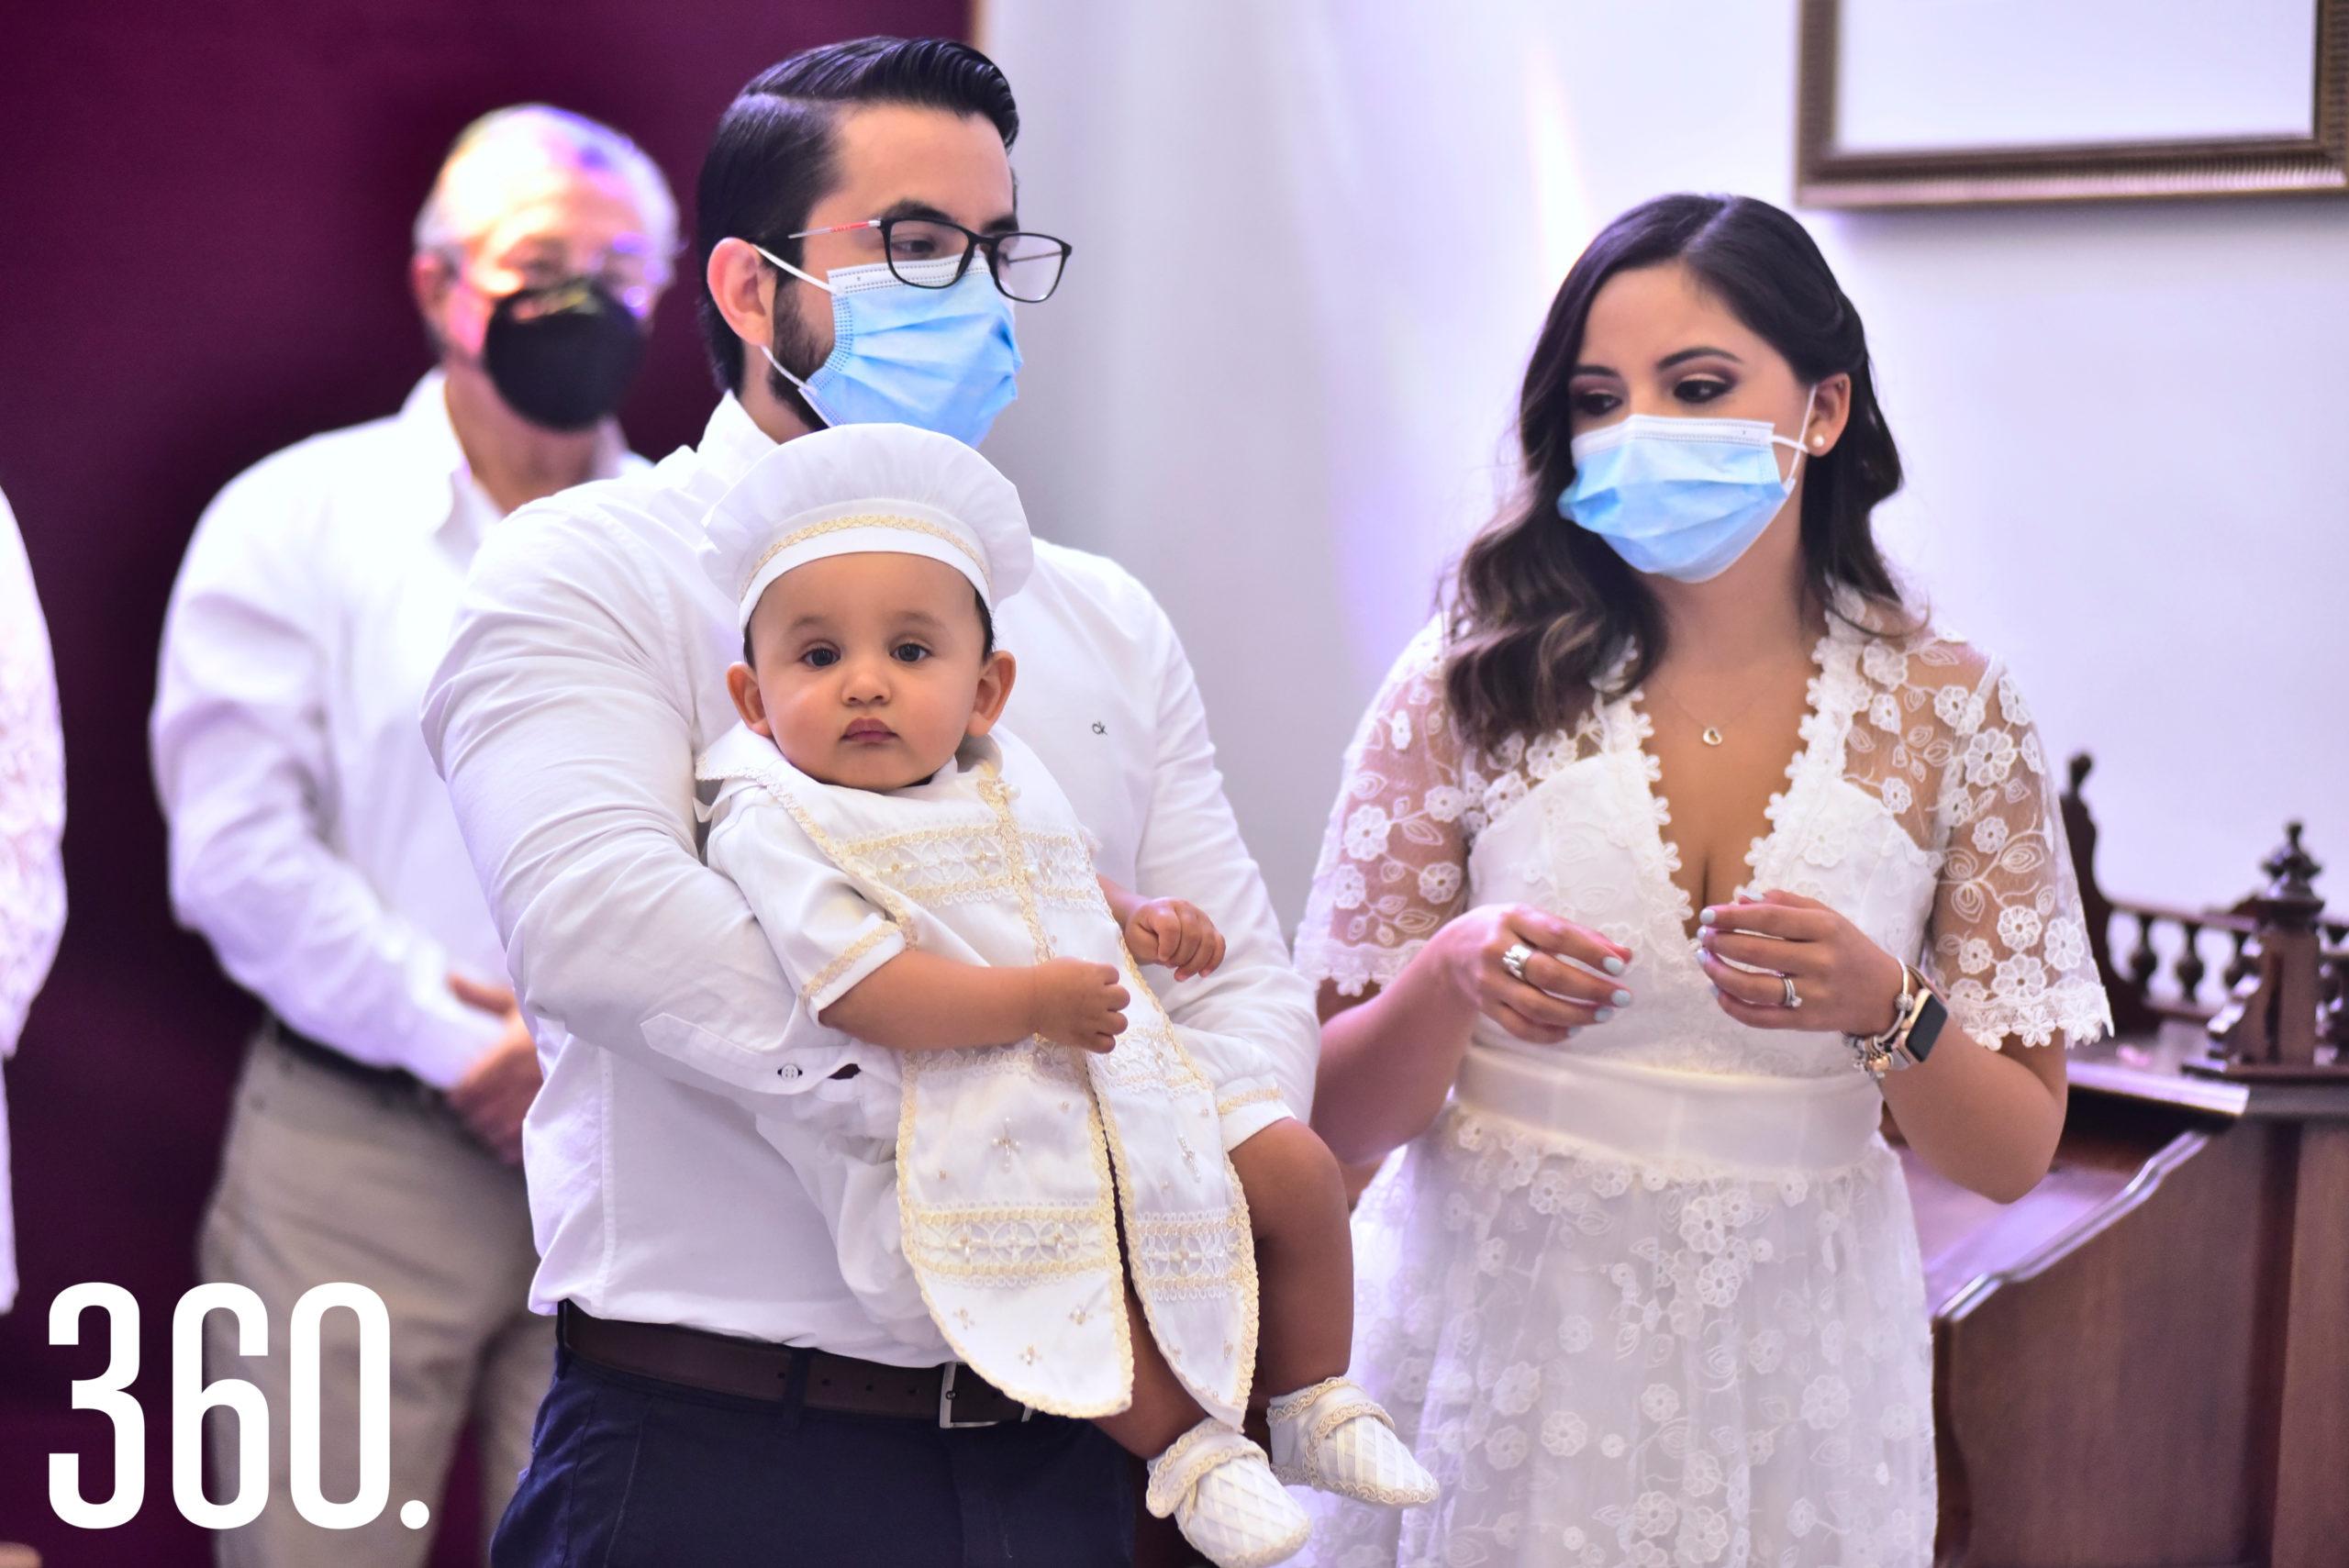 Armando Barragán Sousa con sus papás Armando Barragán y Paola Sousa.